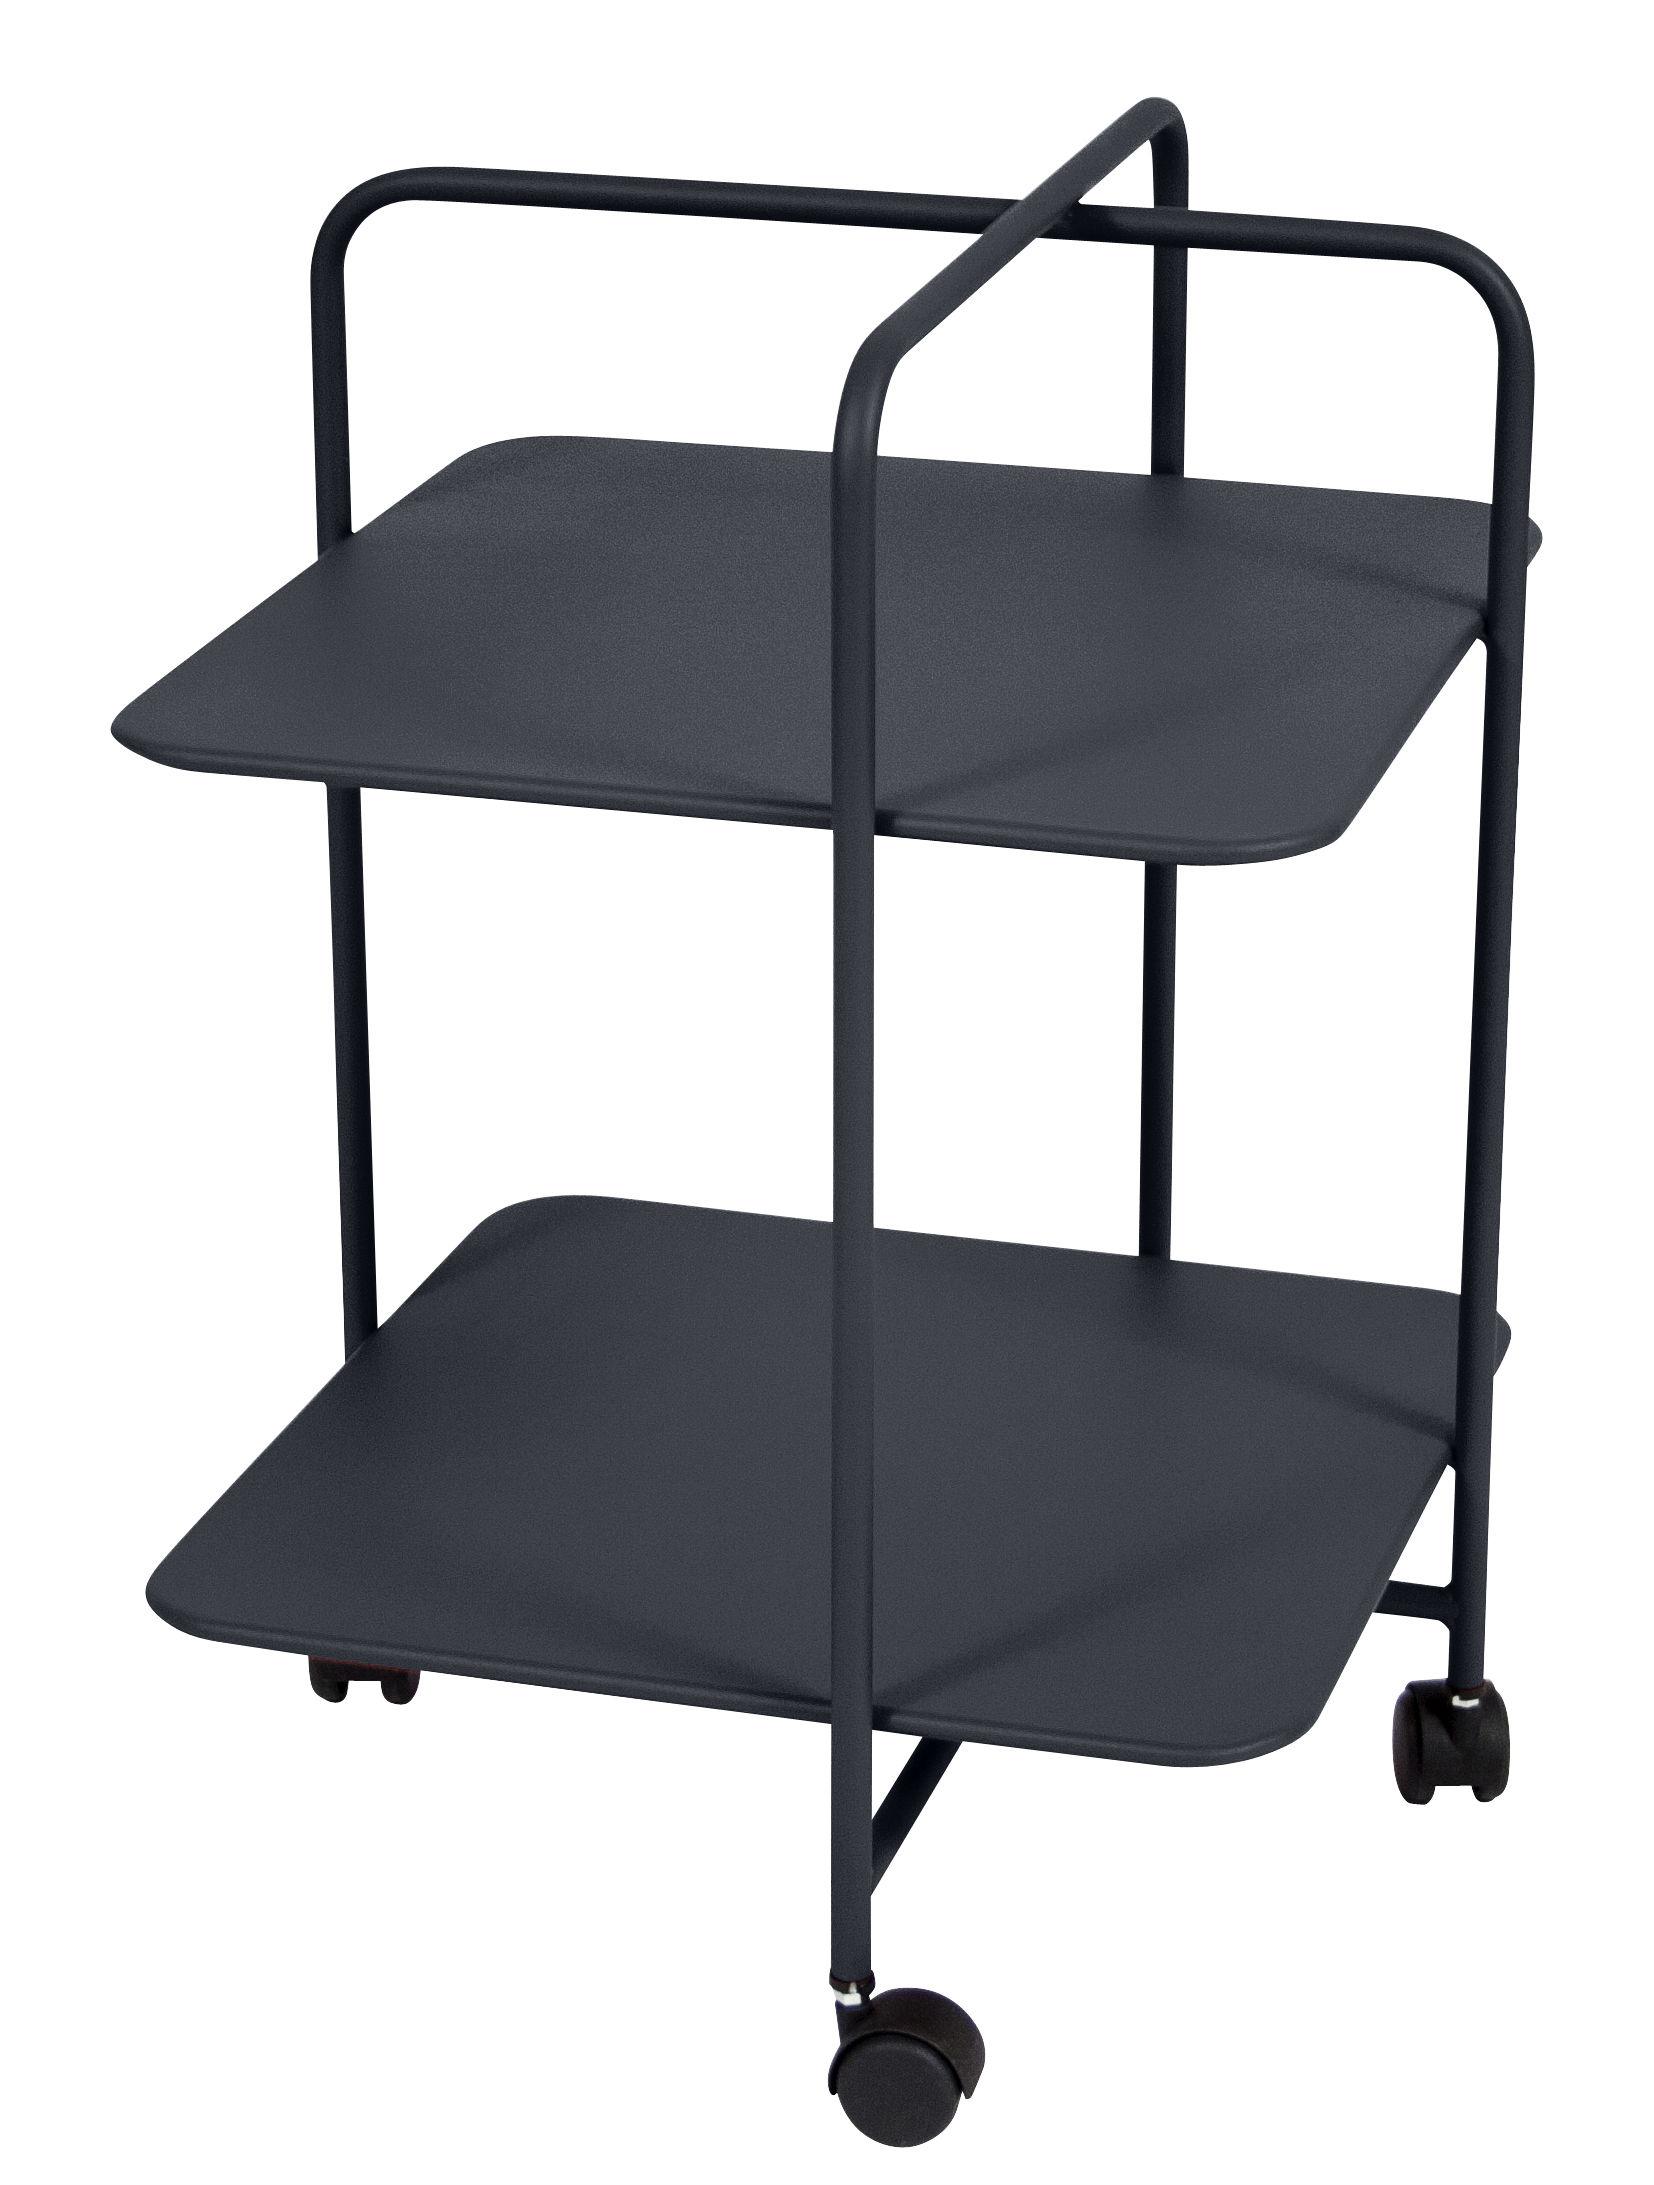 Arredamento - Tavolini  - Carrello bar Alfred / Pascal Mourgue - Fermob - Carbone - Acciaio, Plastica